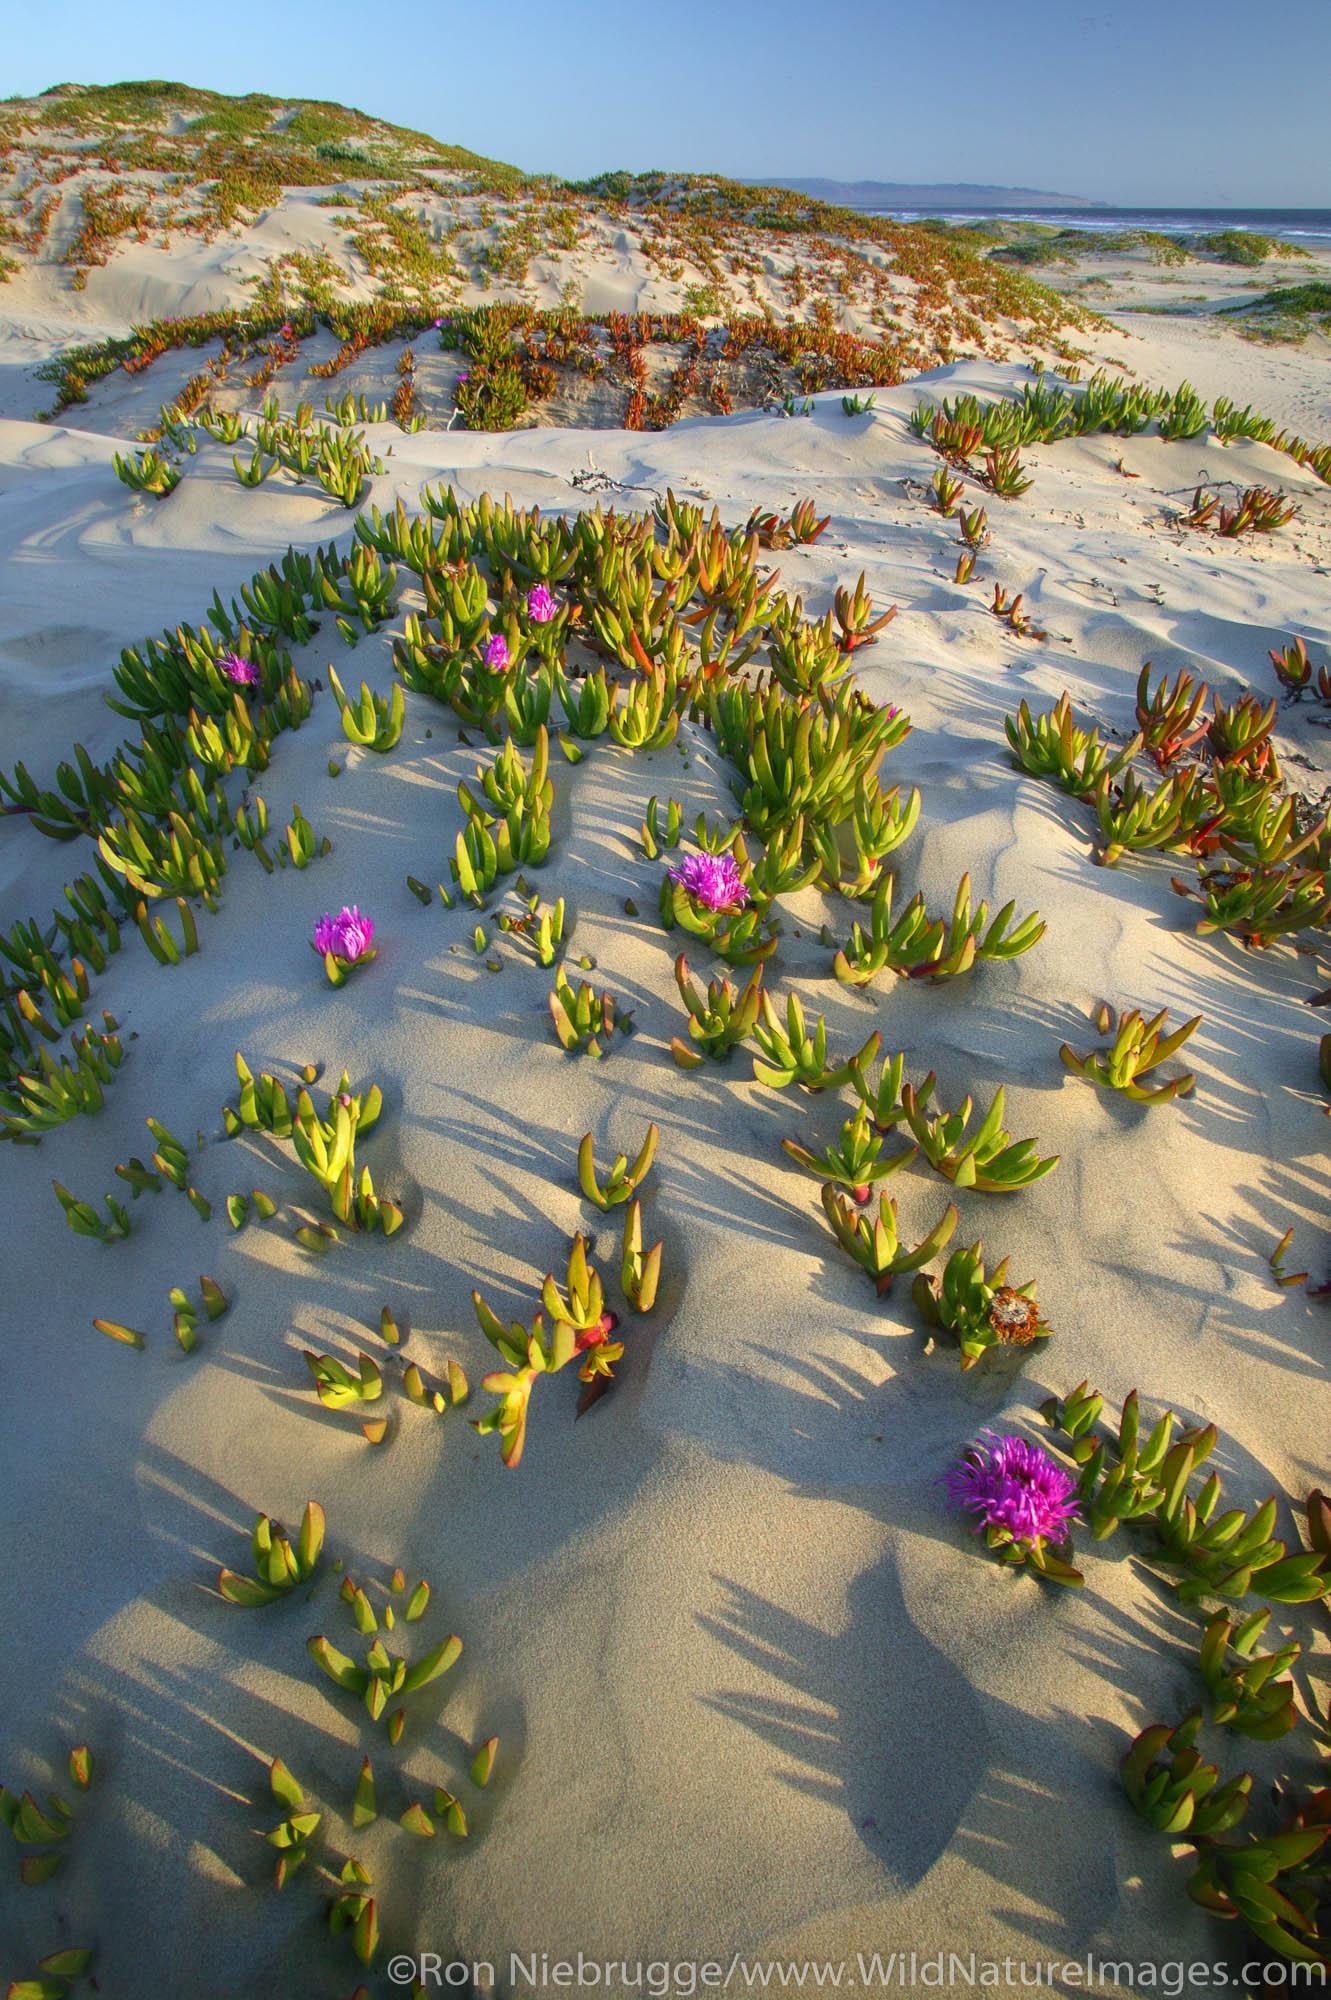 Sand Dunes with Sea Fig (Carpobrotus chilensis), Pismo State Beach,  California.